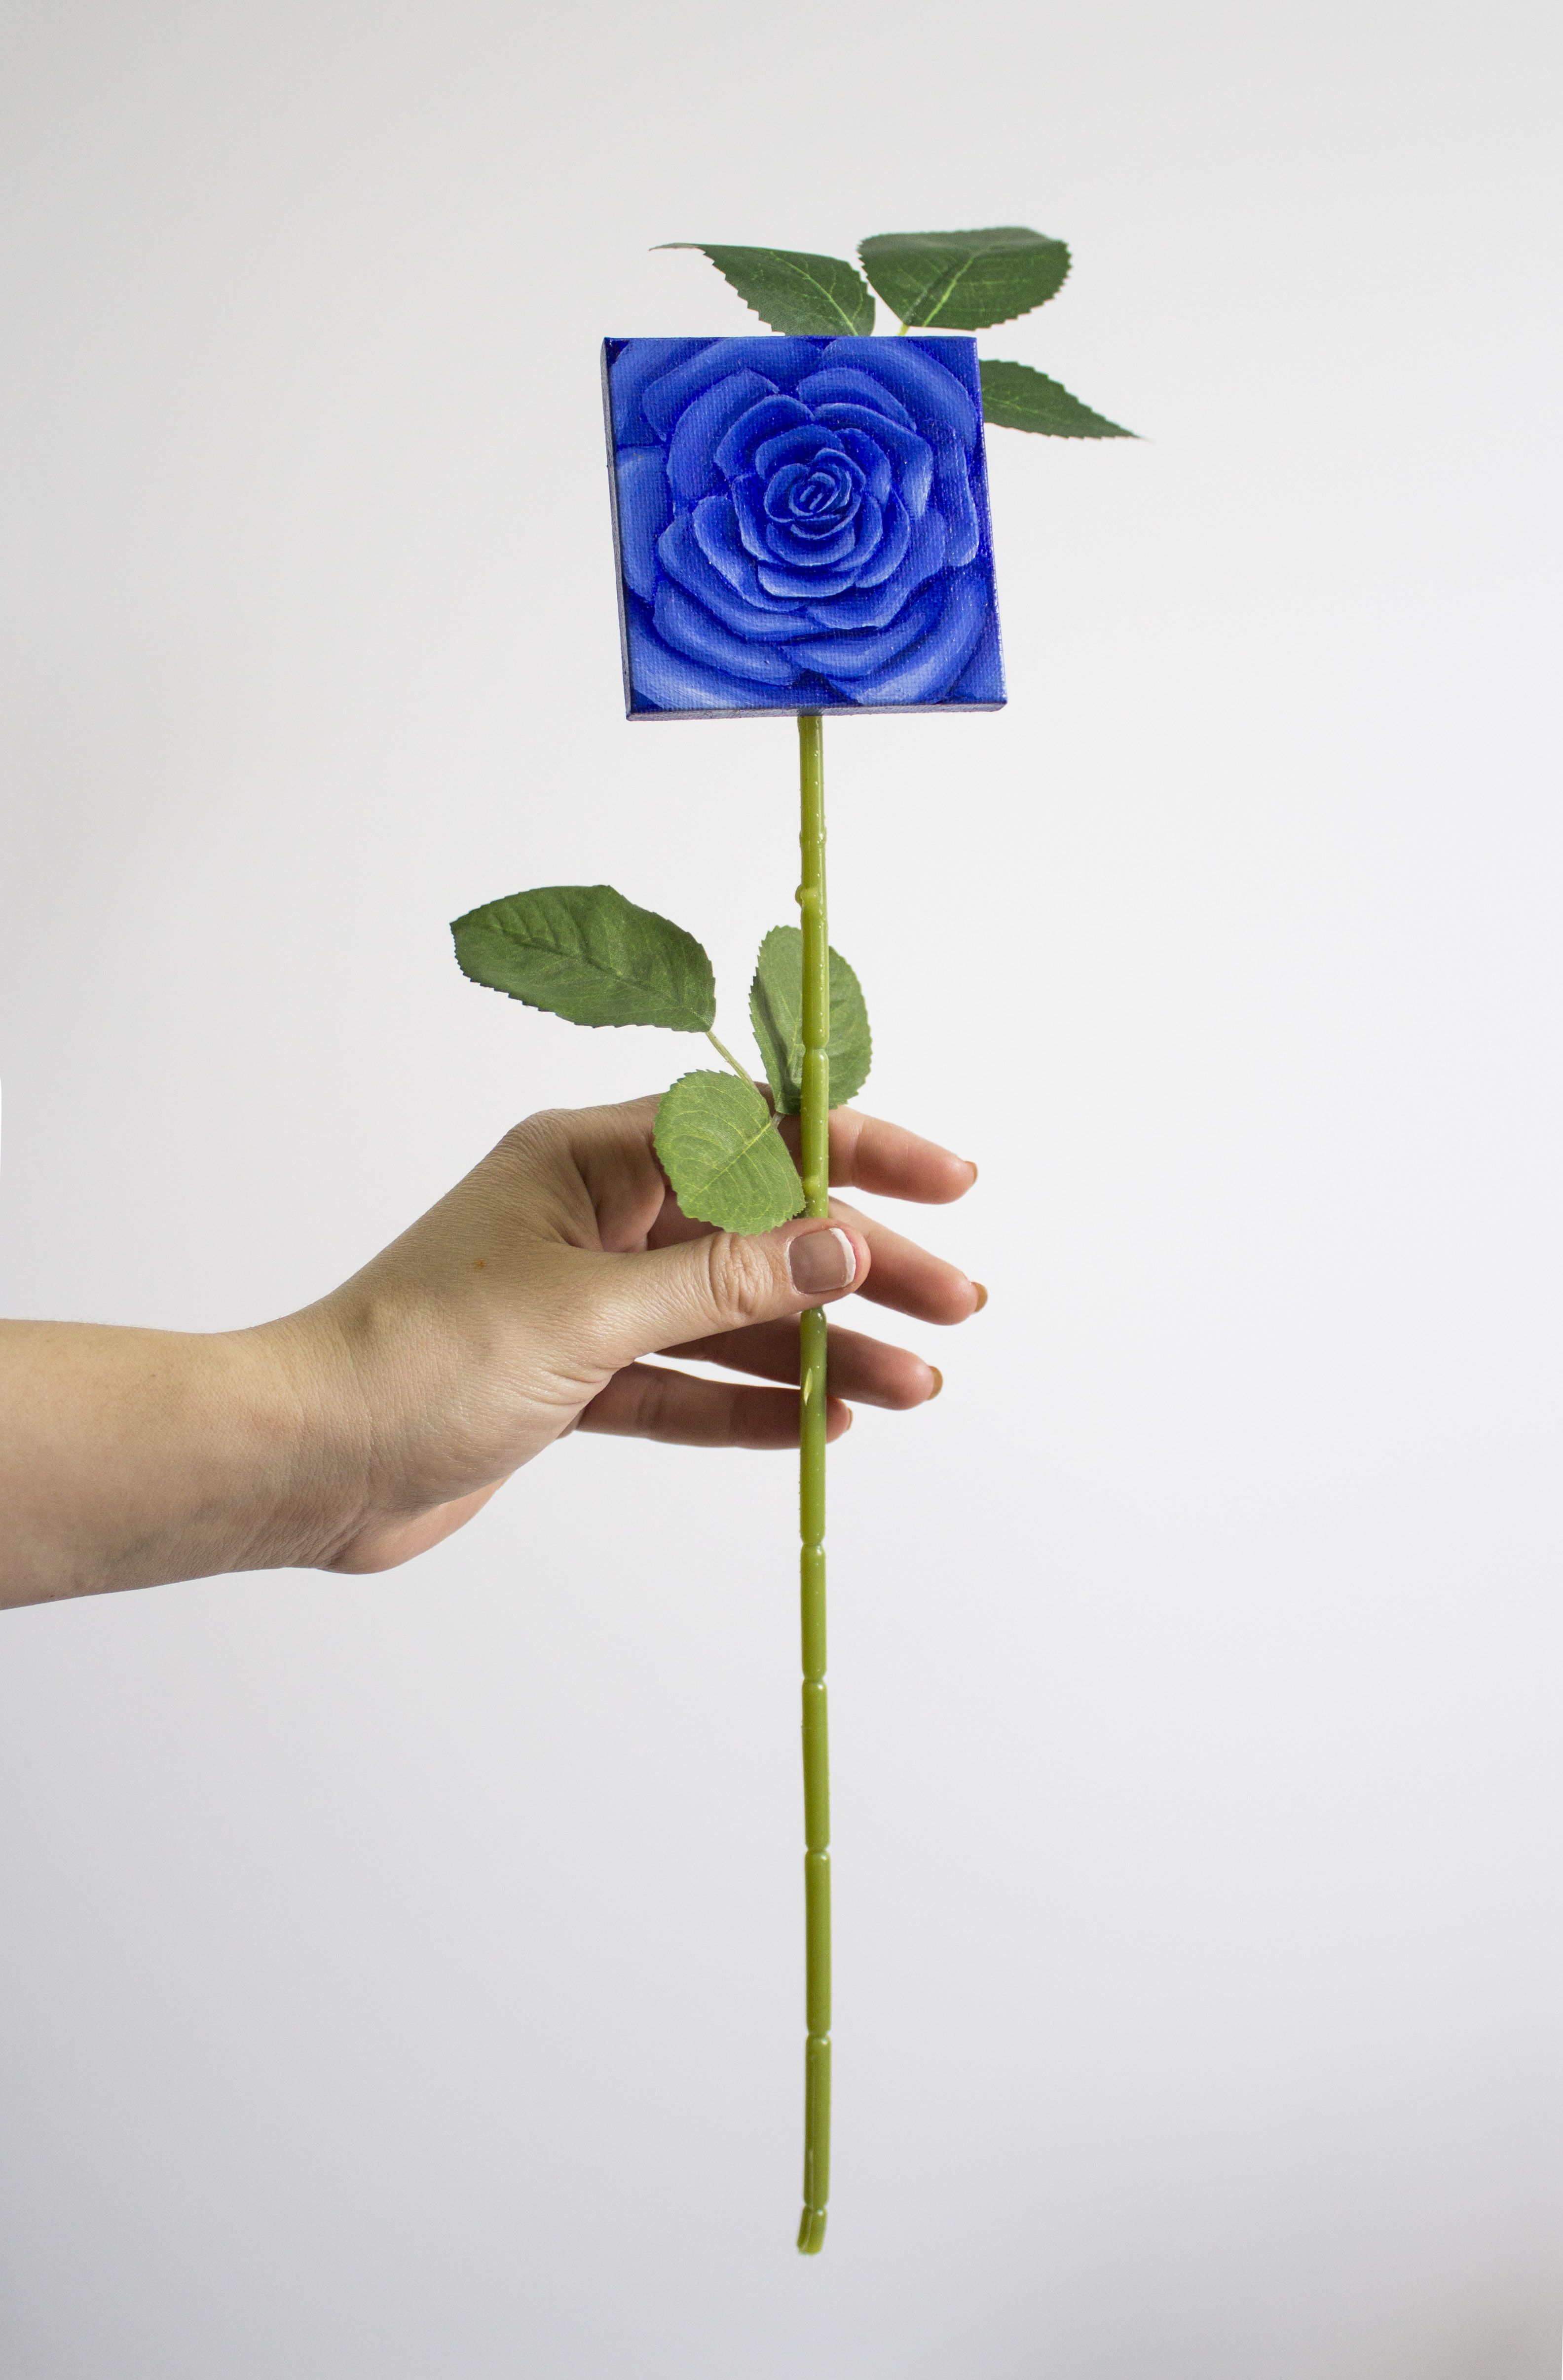 Multicolor Forever Rose_Blue Rose 1